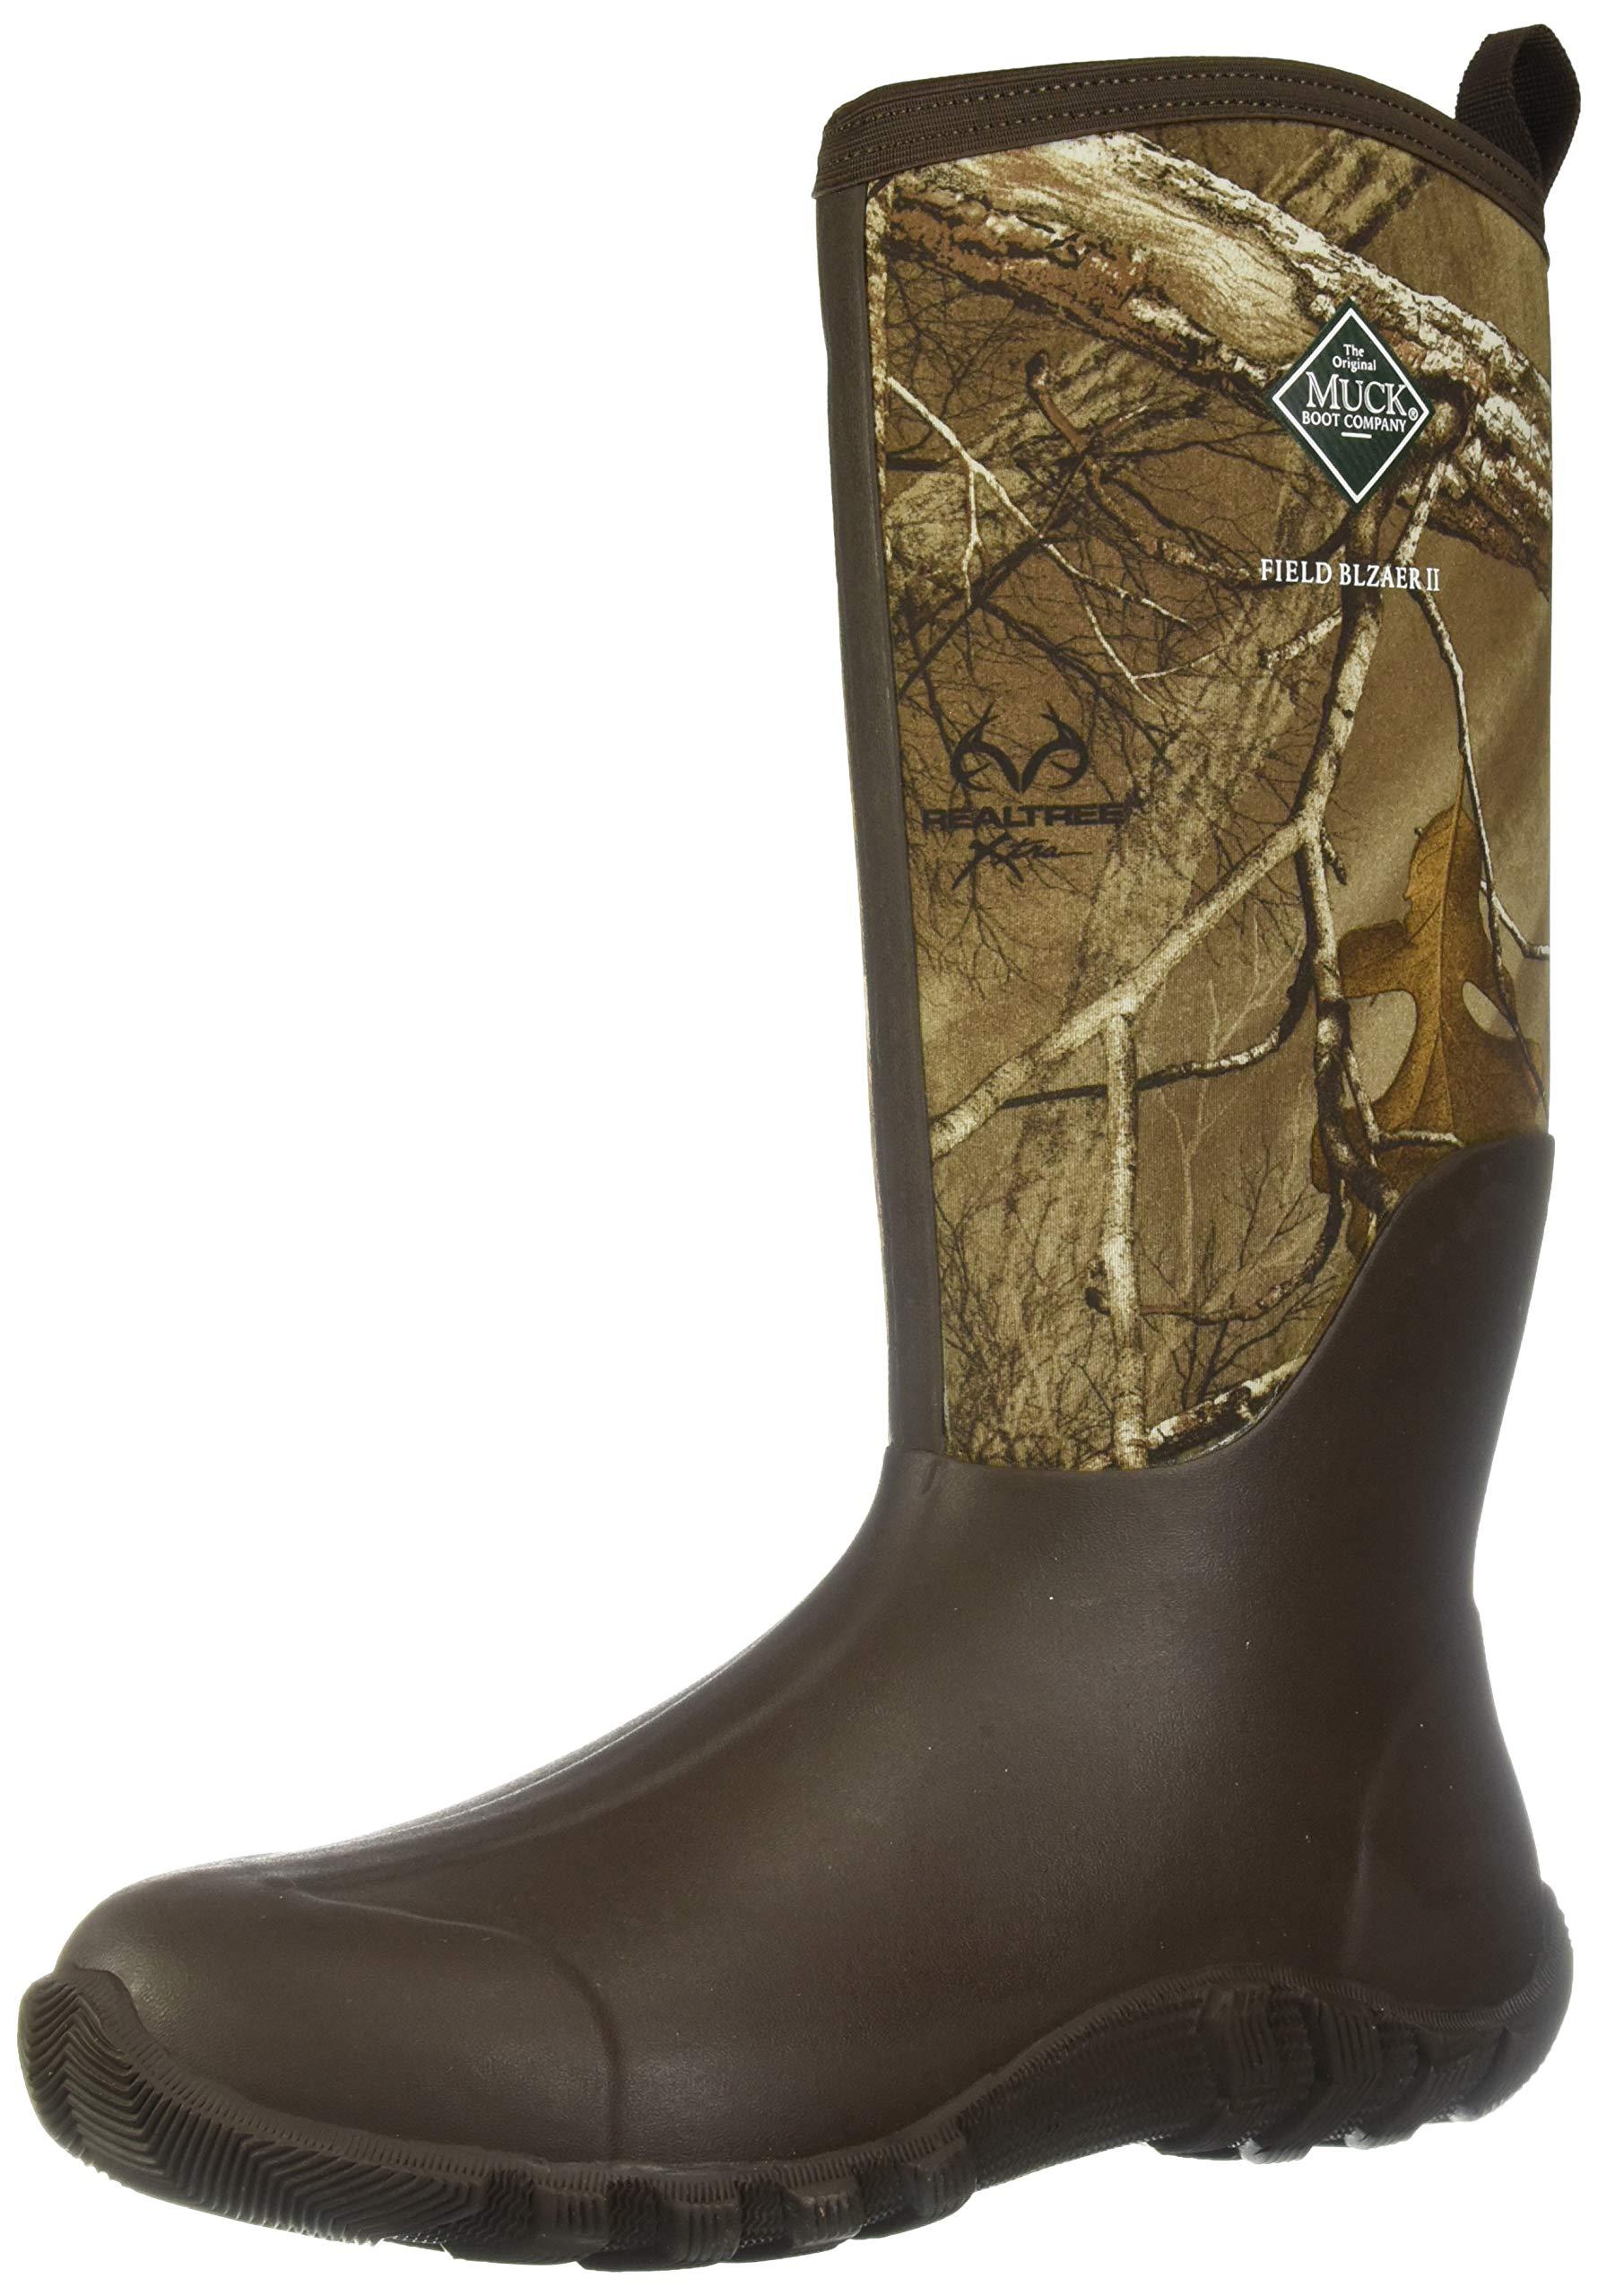 Muck Boot Men's Feildblazer II Knee High Boot, Realtree Extra, 12 Regular US by Muck Boot